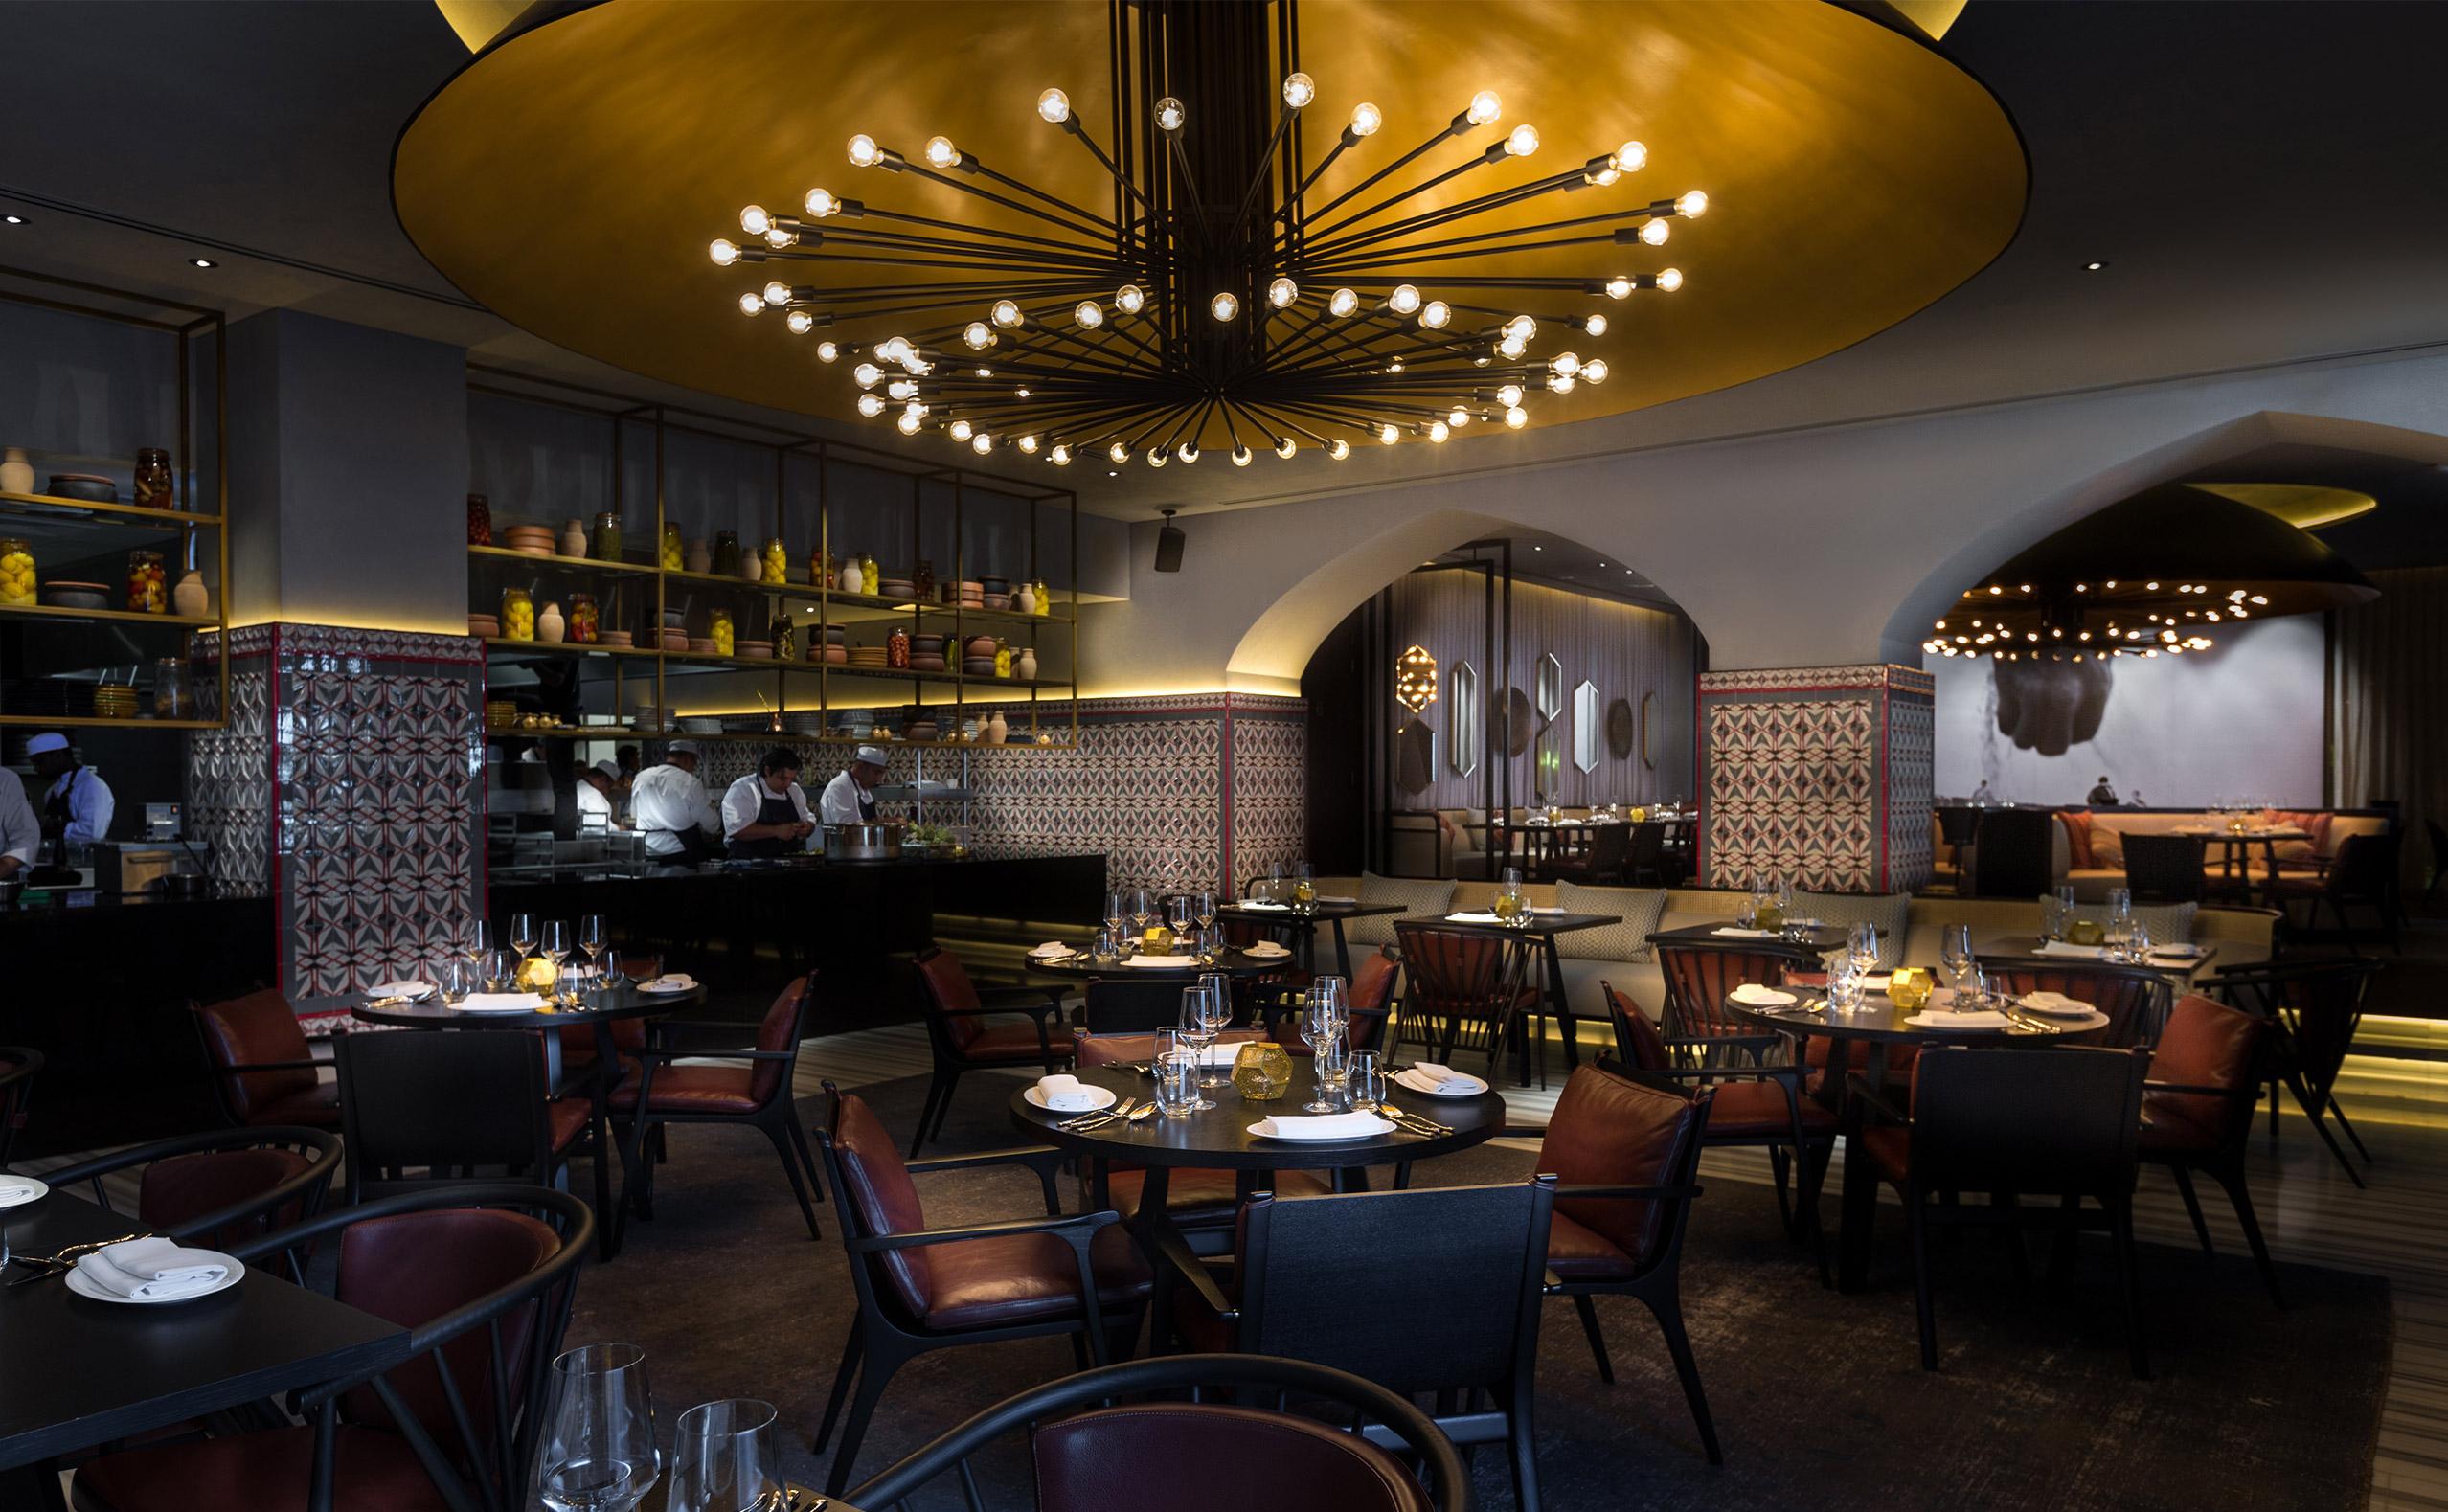 Benefits Of Interior Decoration In Restaurant Business Edbenesart